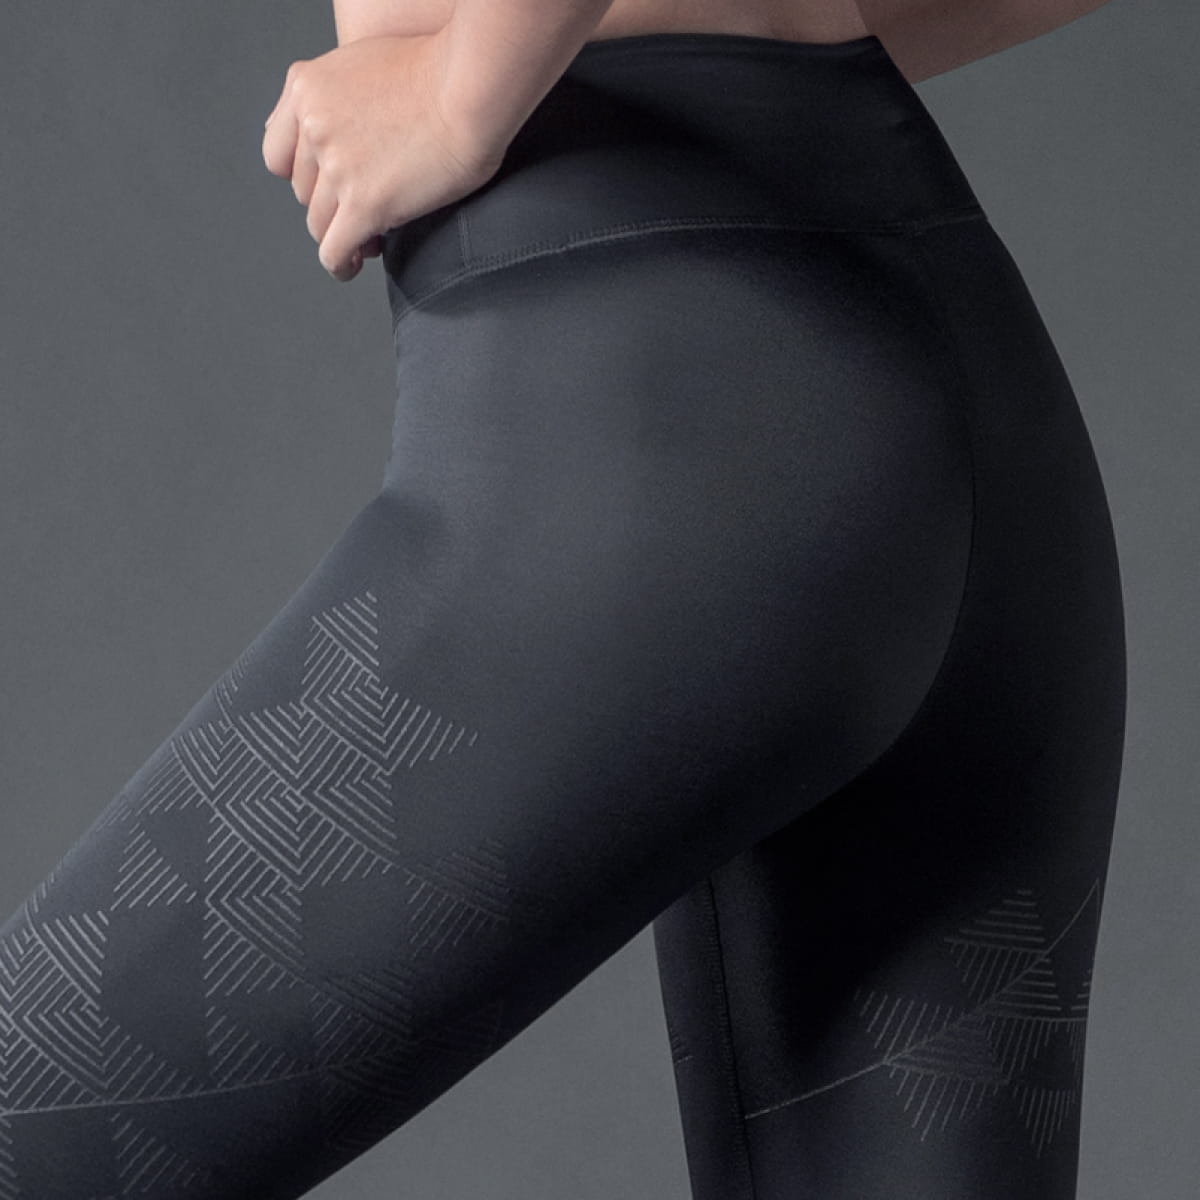 TENO超彈感美型健身褲-Mountain山稜 15